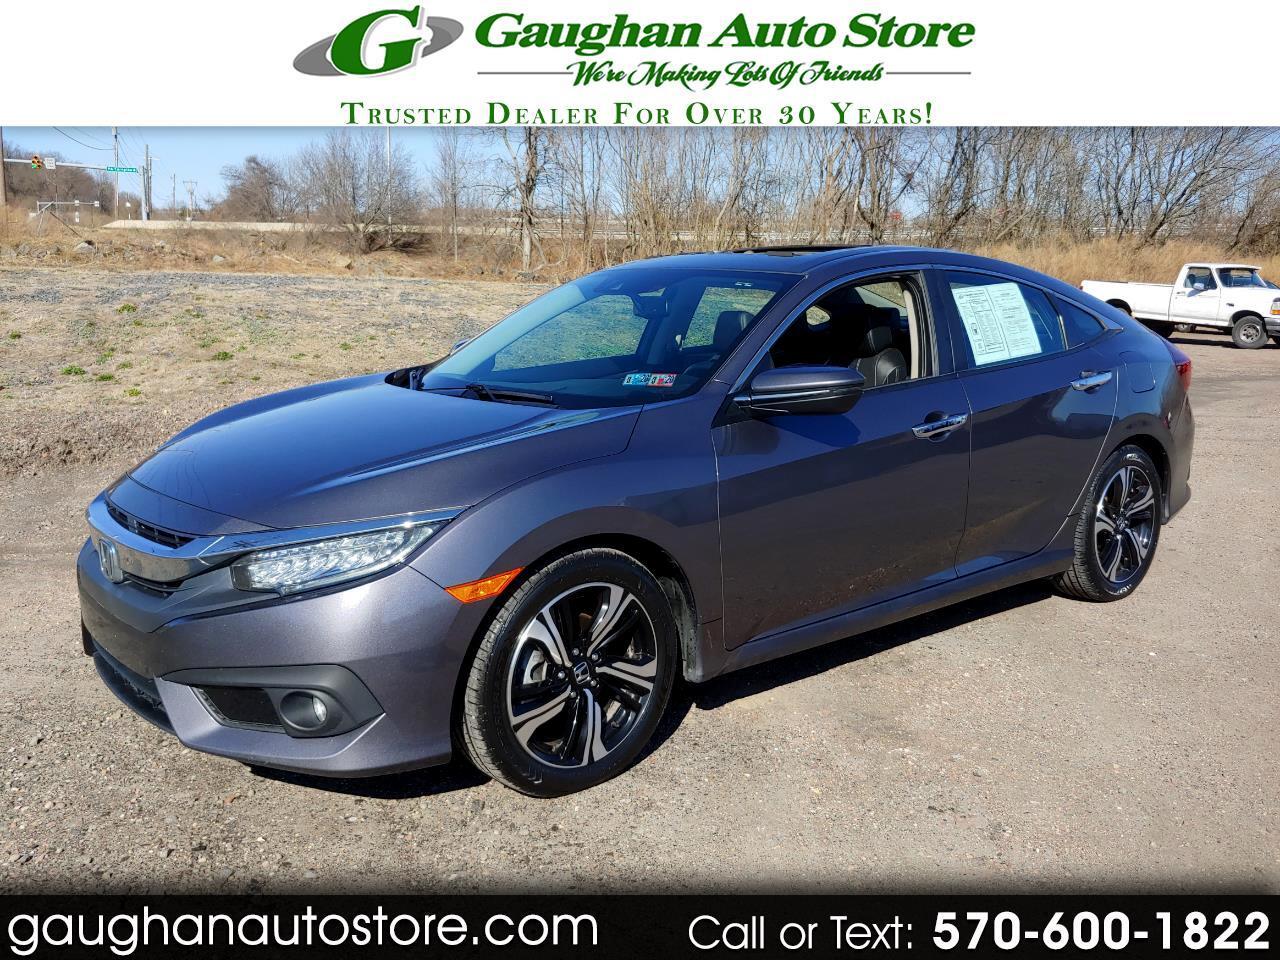 2016 Honda Civic Sedan Touring Edition